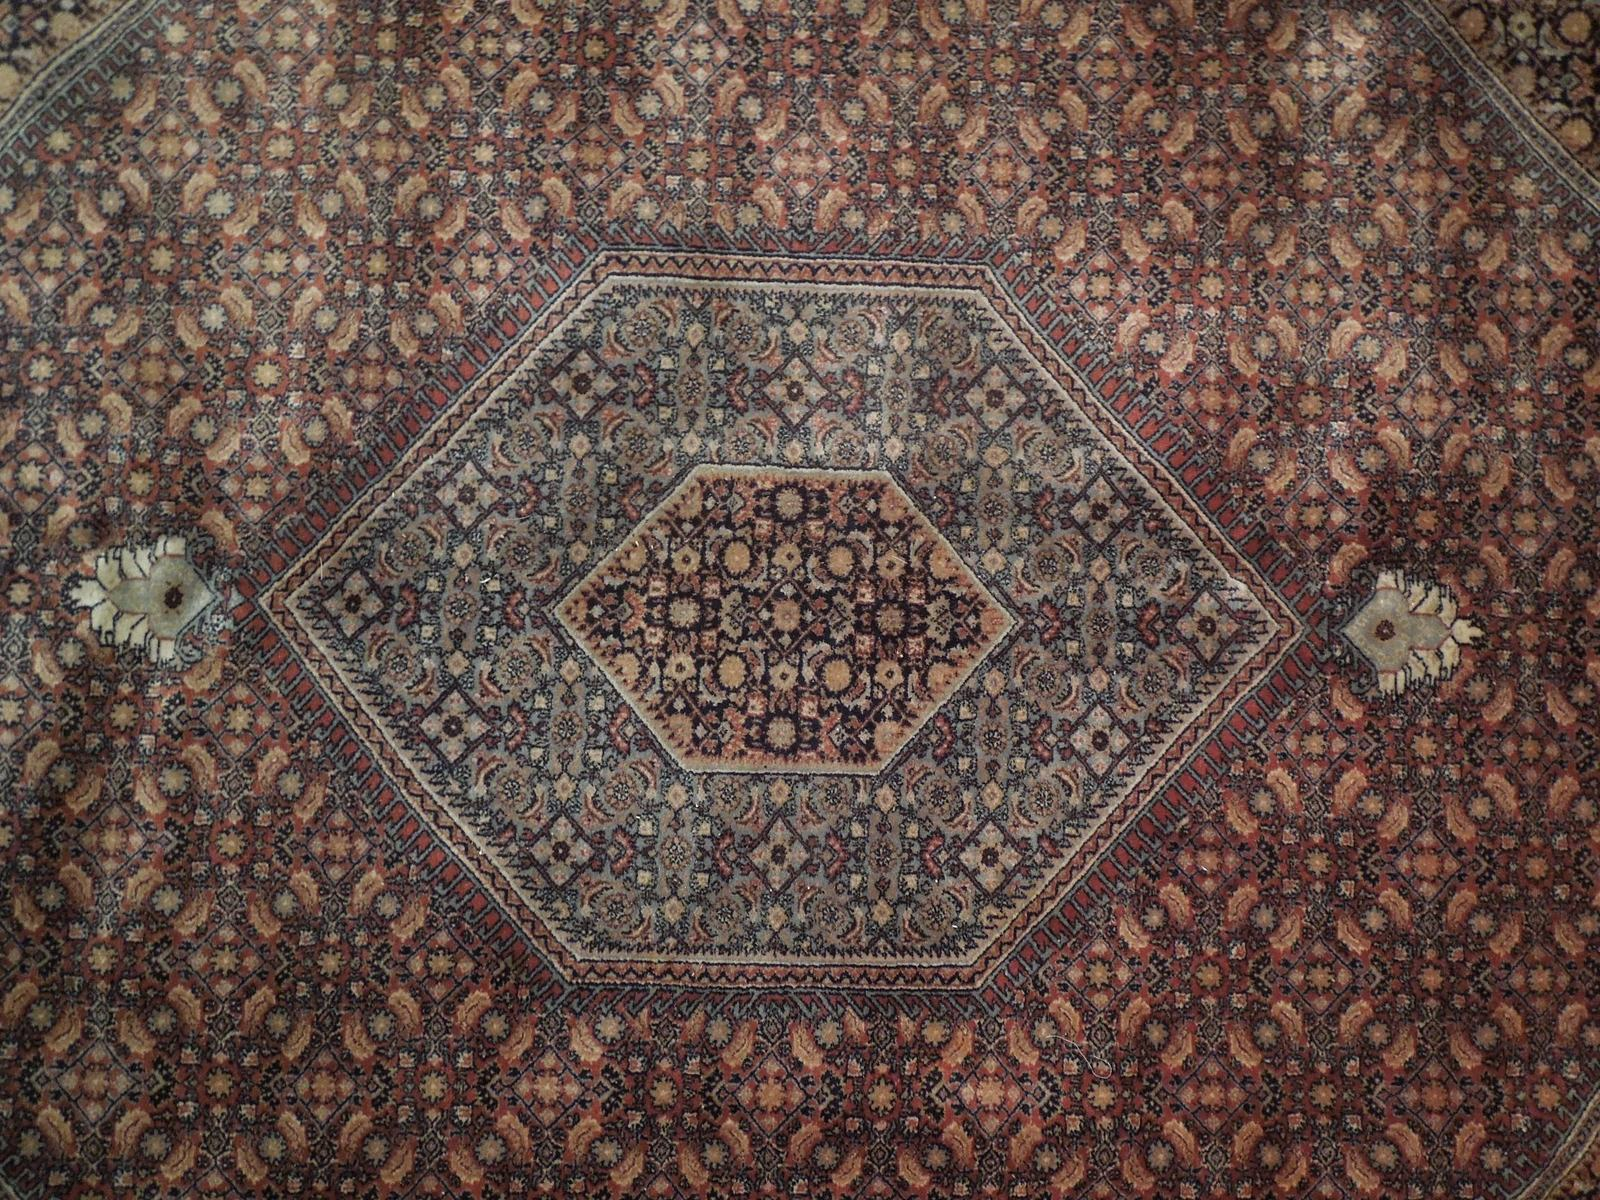 10 x 13 Brick Red Black New Indian Bijar Red Jaipur Wool Handmade Rug image 6